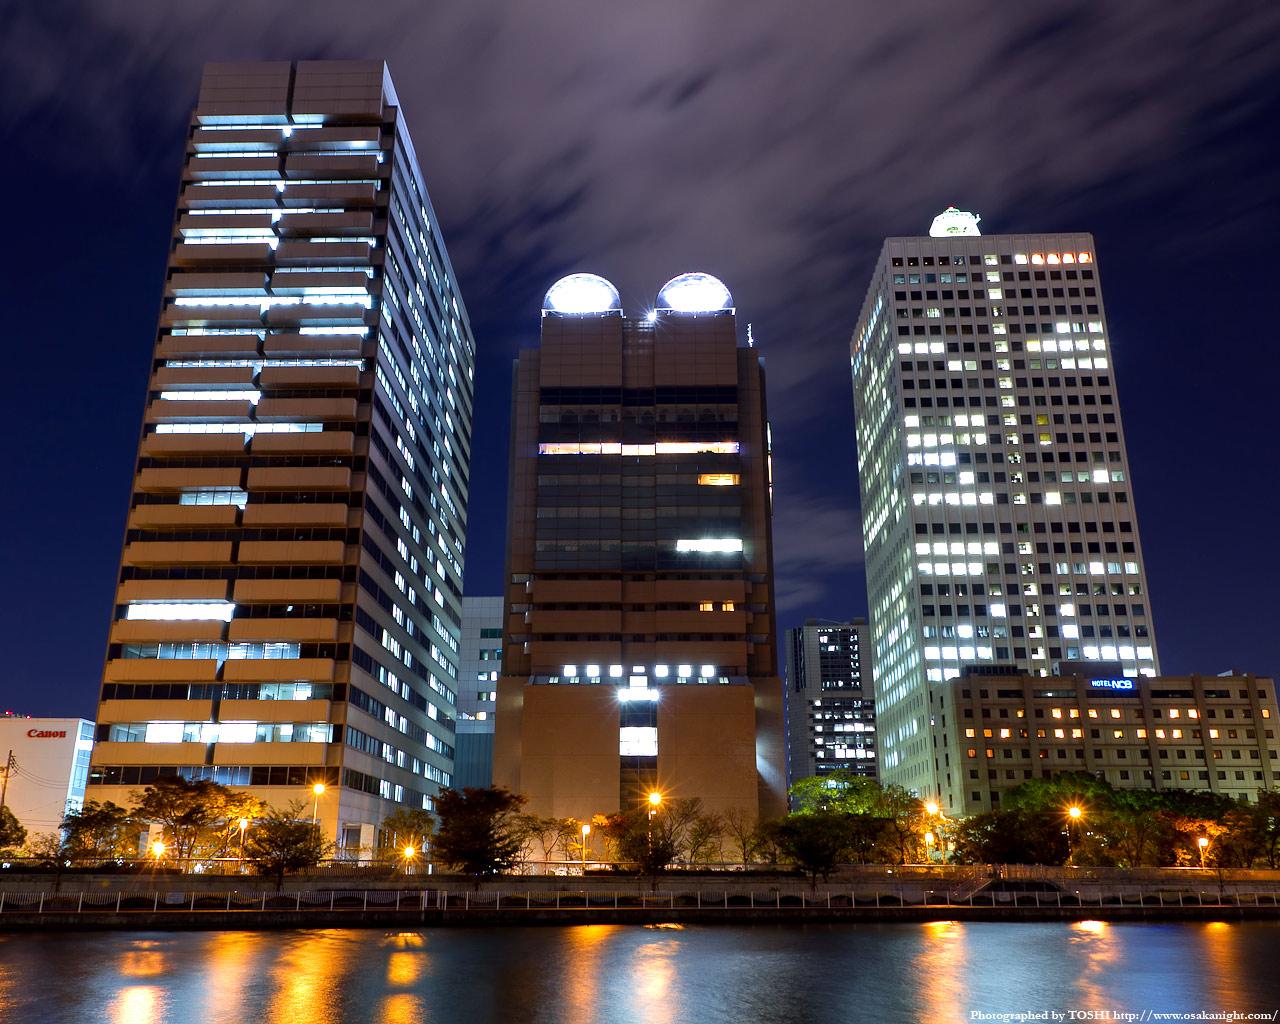 中之島6丁目の高層ビル群夜景2